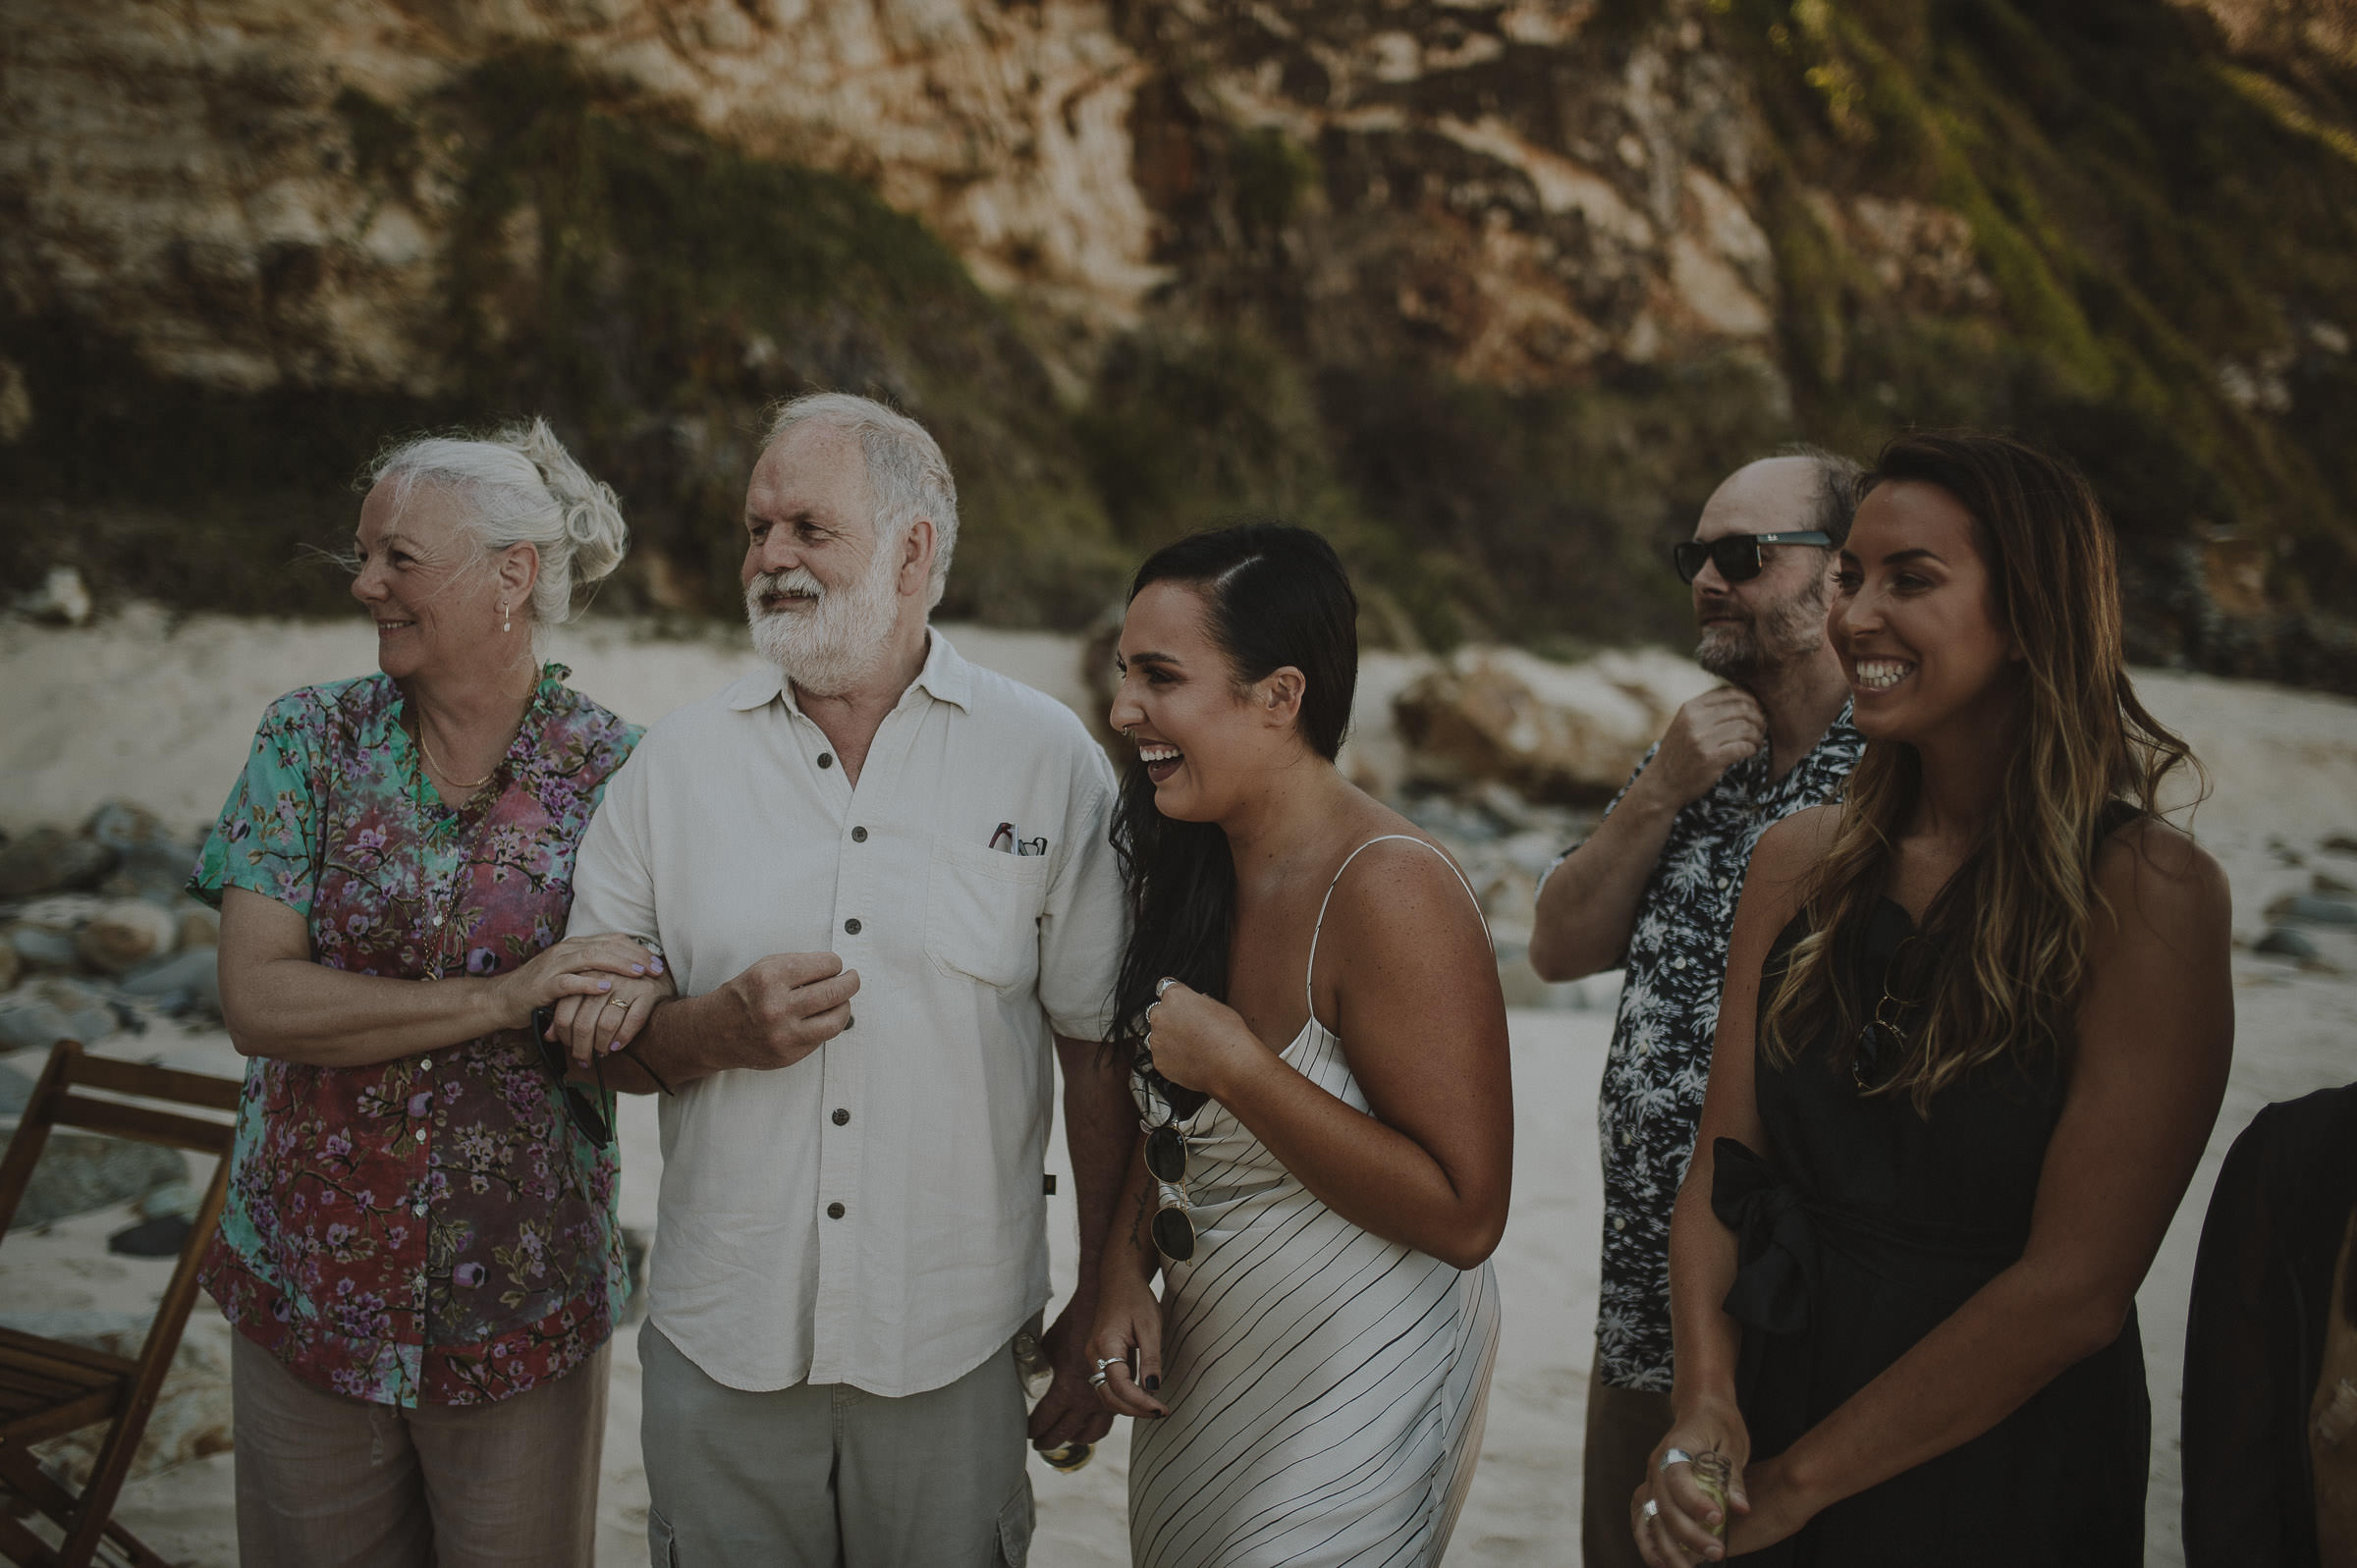 Jack_Millie_Seal_Rocks_Wedding_Photographer_Blog-43.jpg